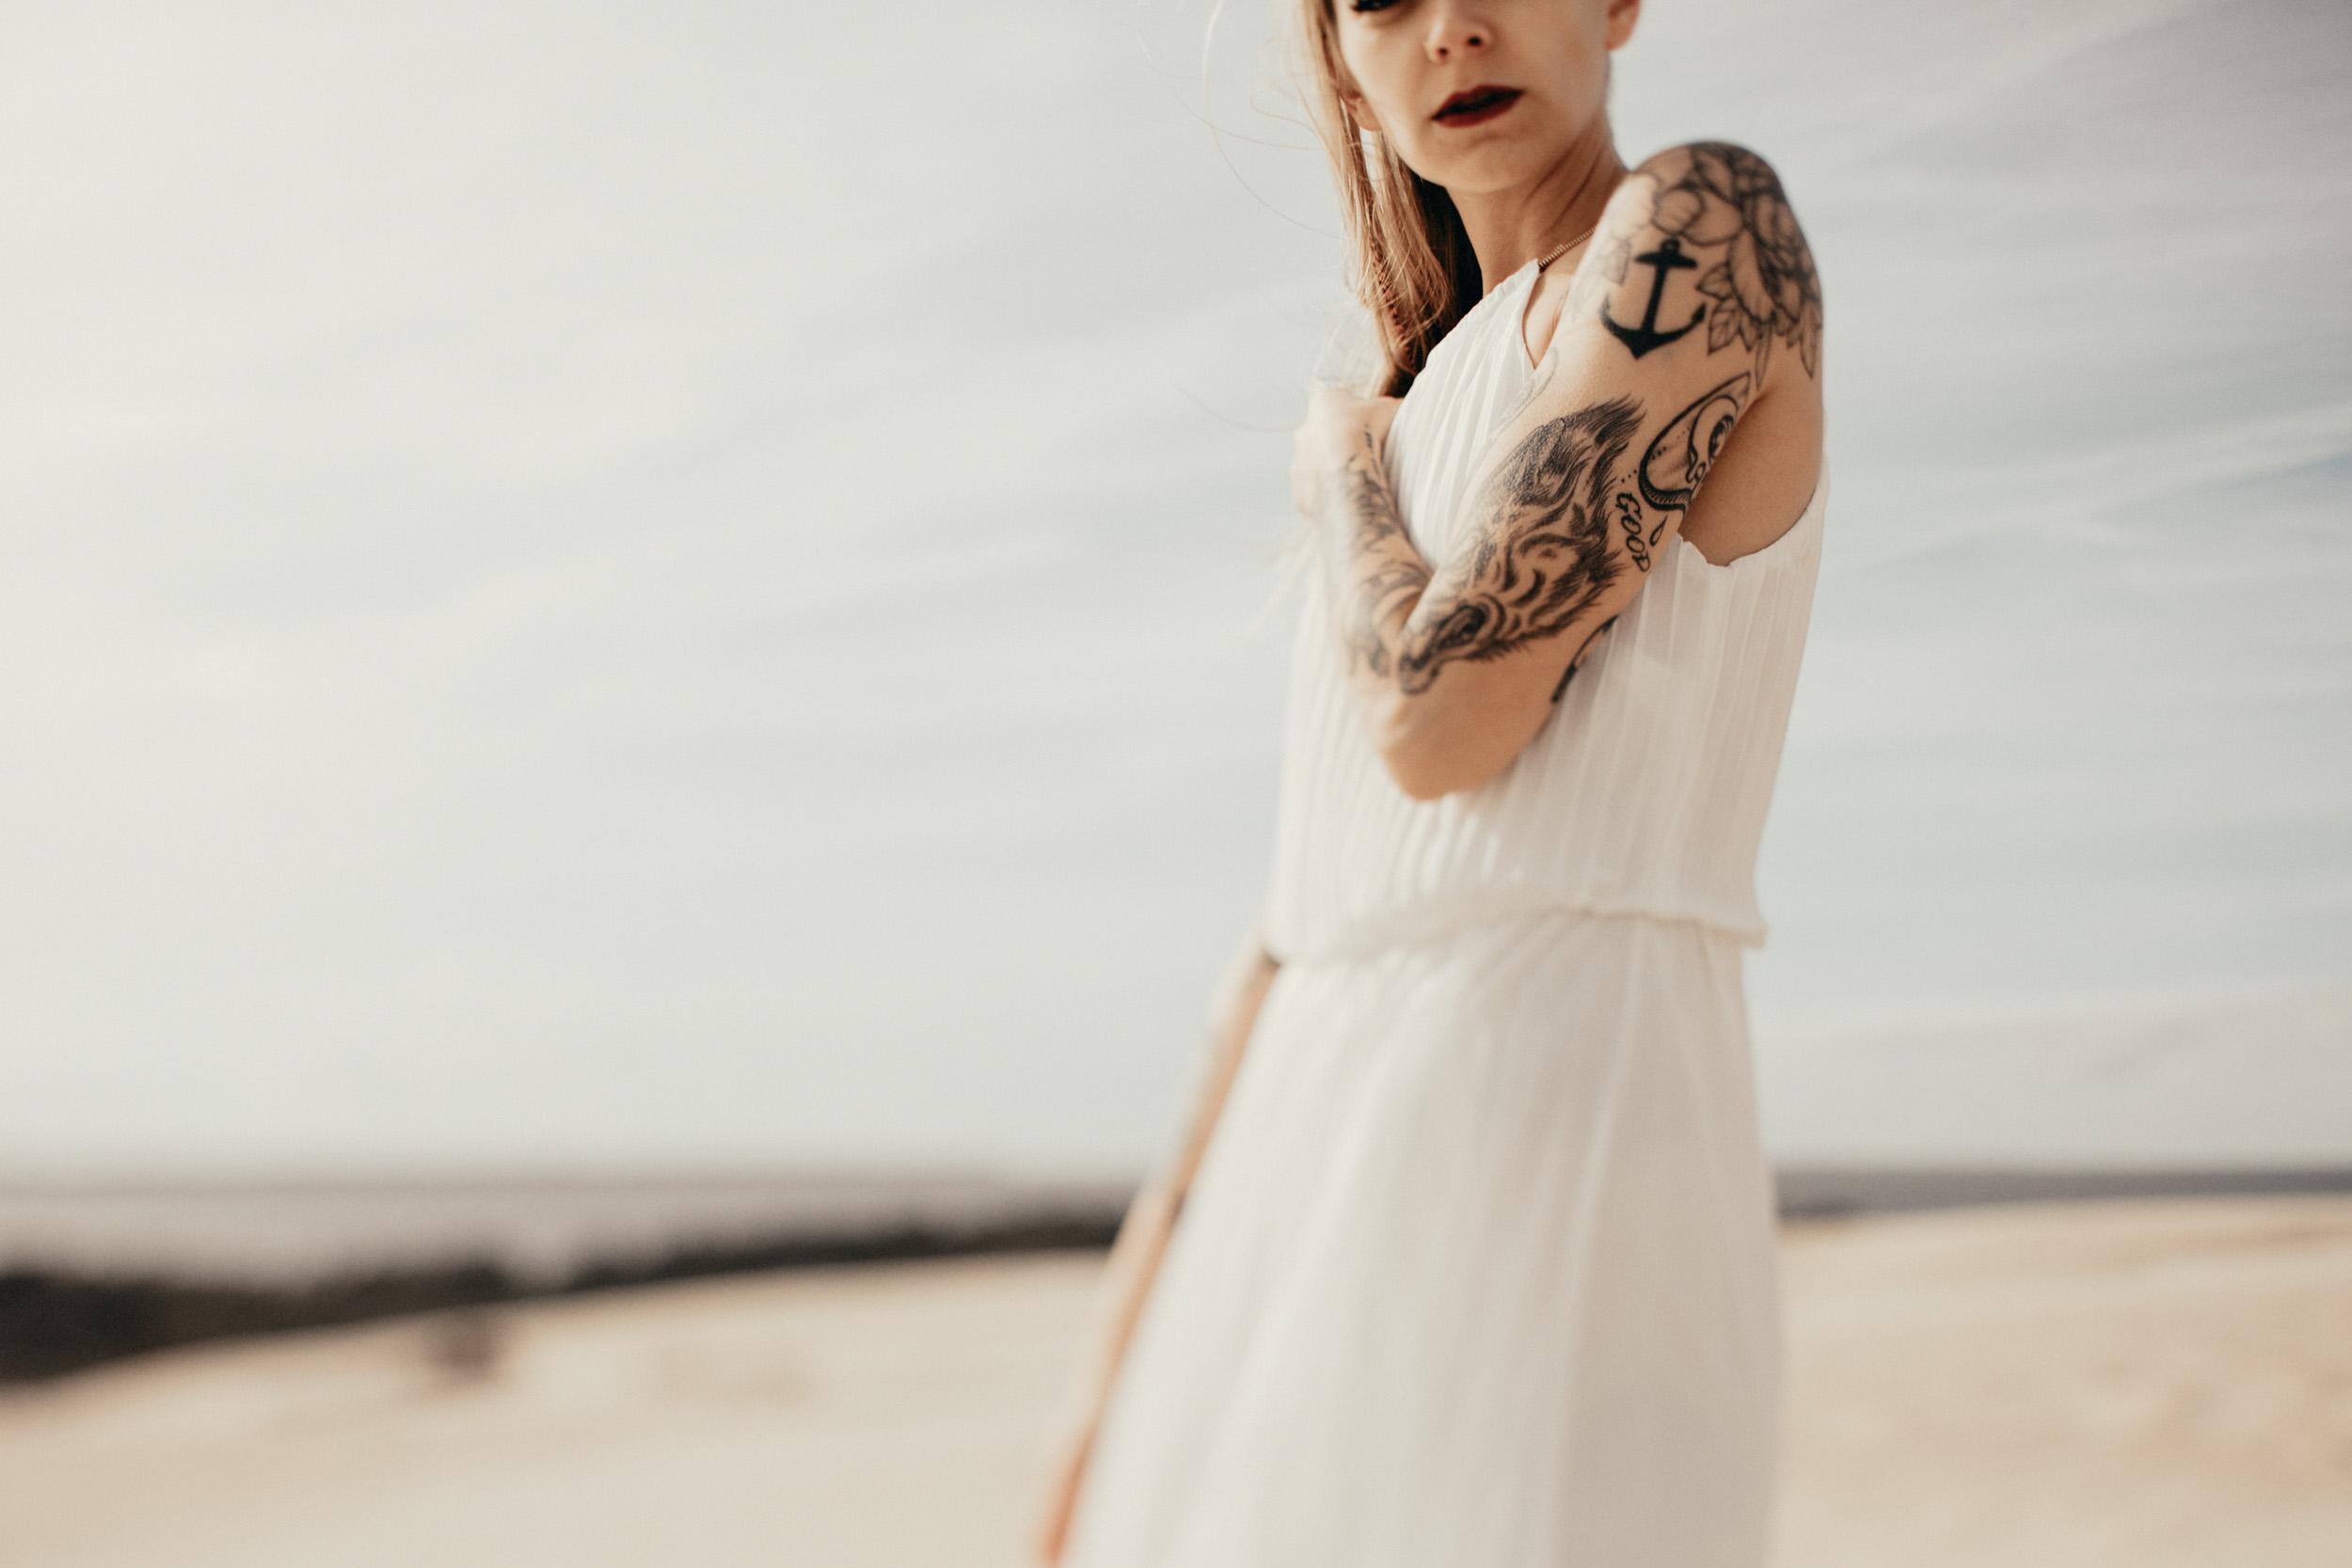 alternative-bride-photography-3.jpg